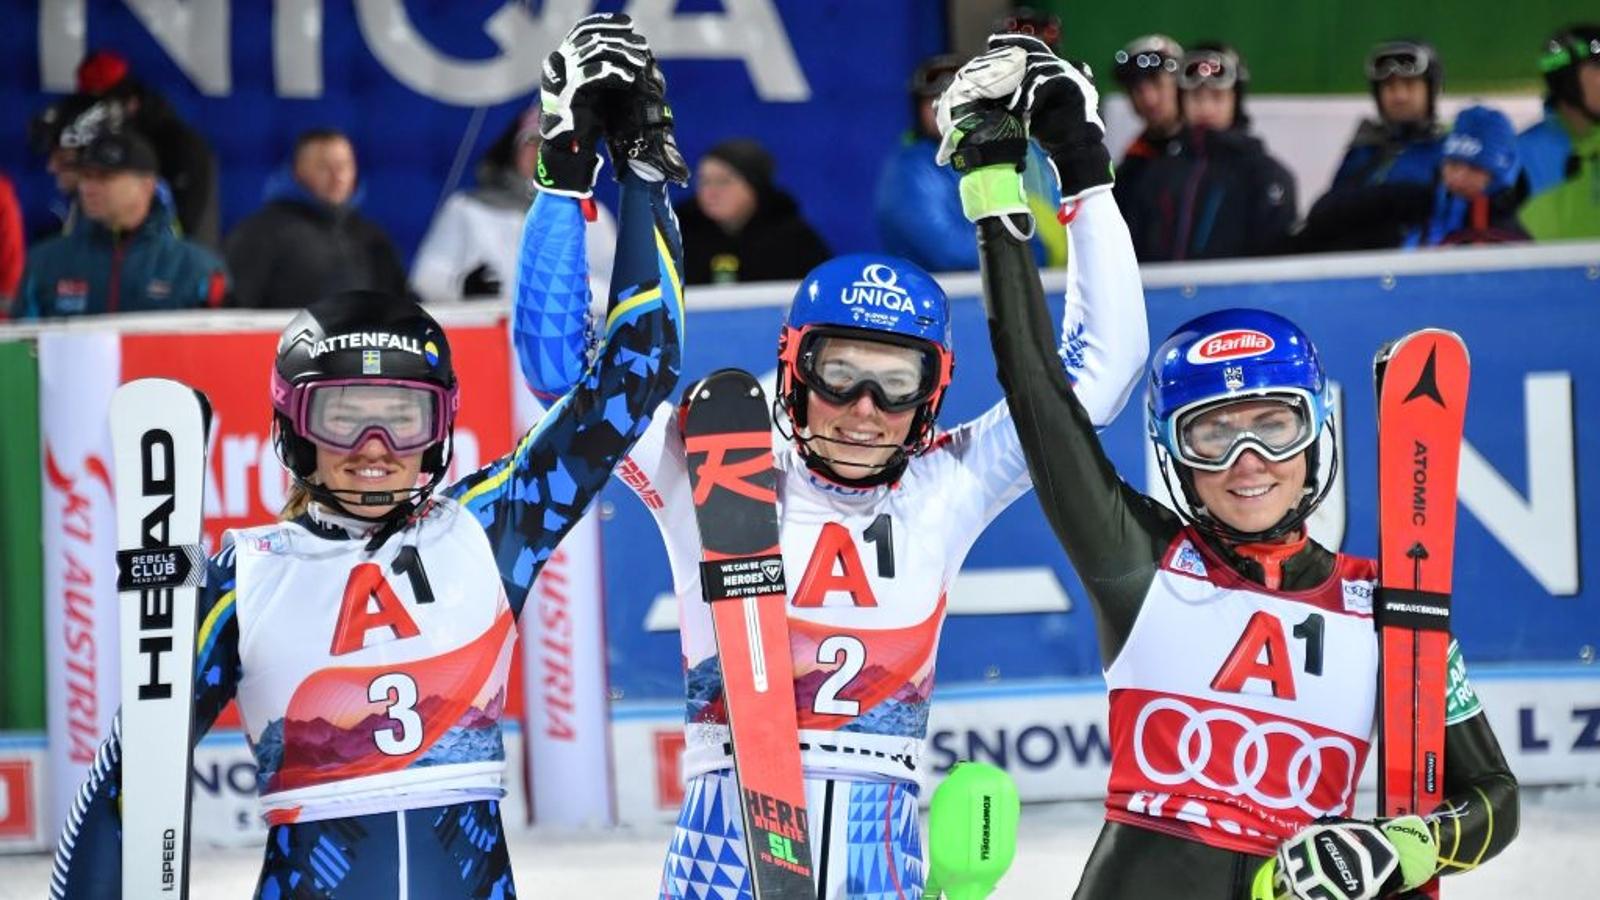 Flachau | Slalom femminile - Sport Invernali - Rai Sport